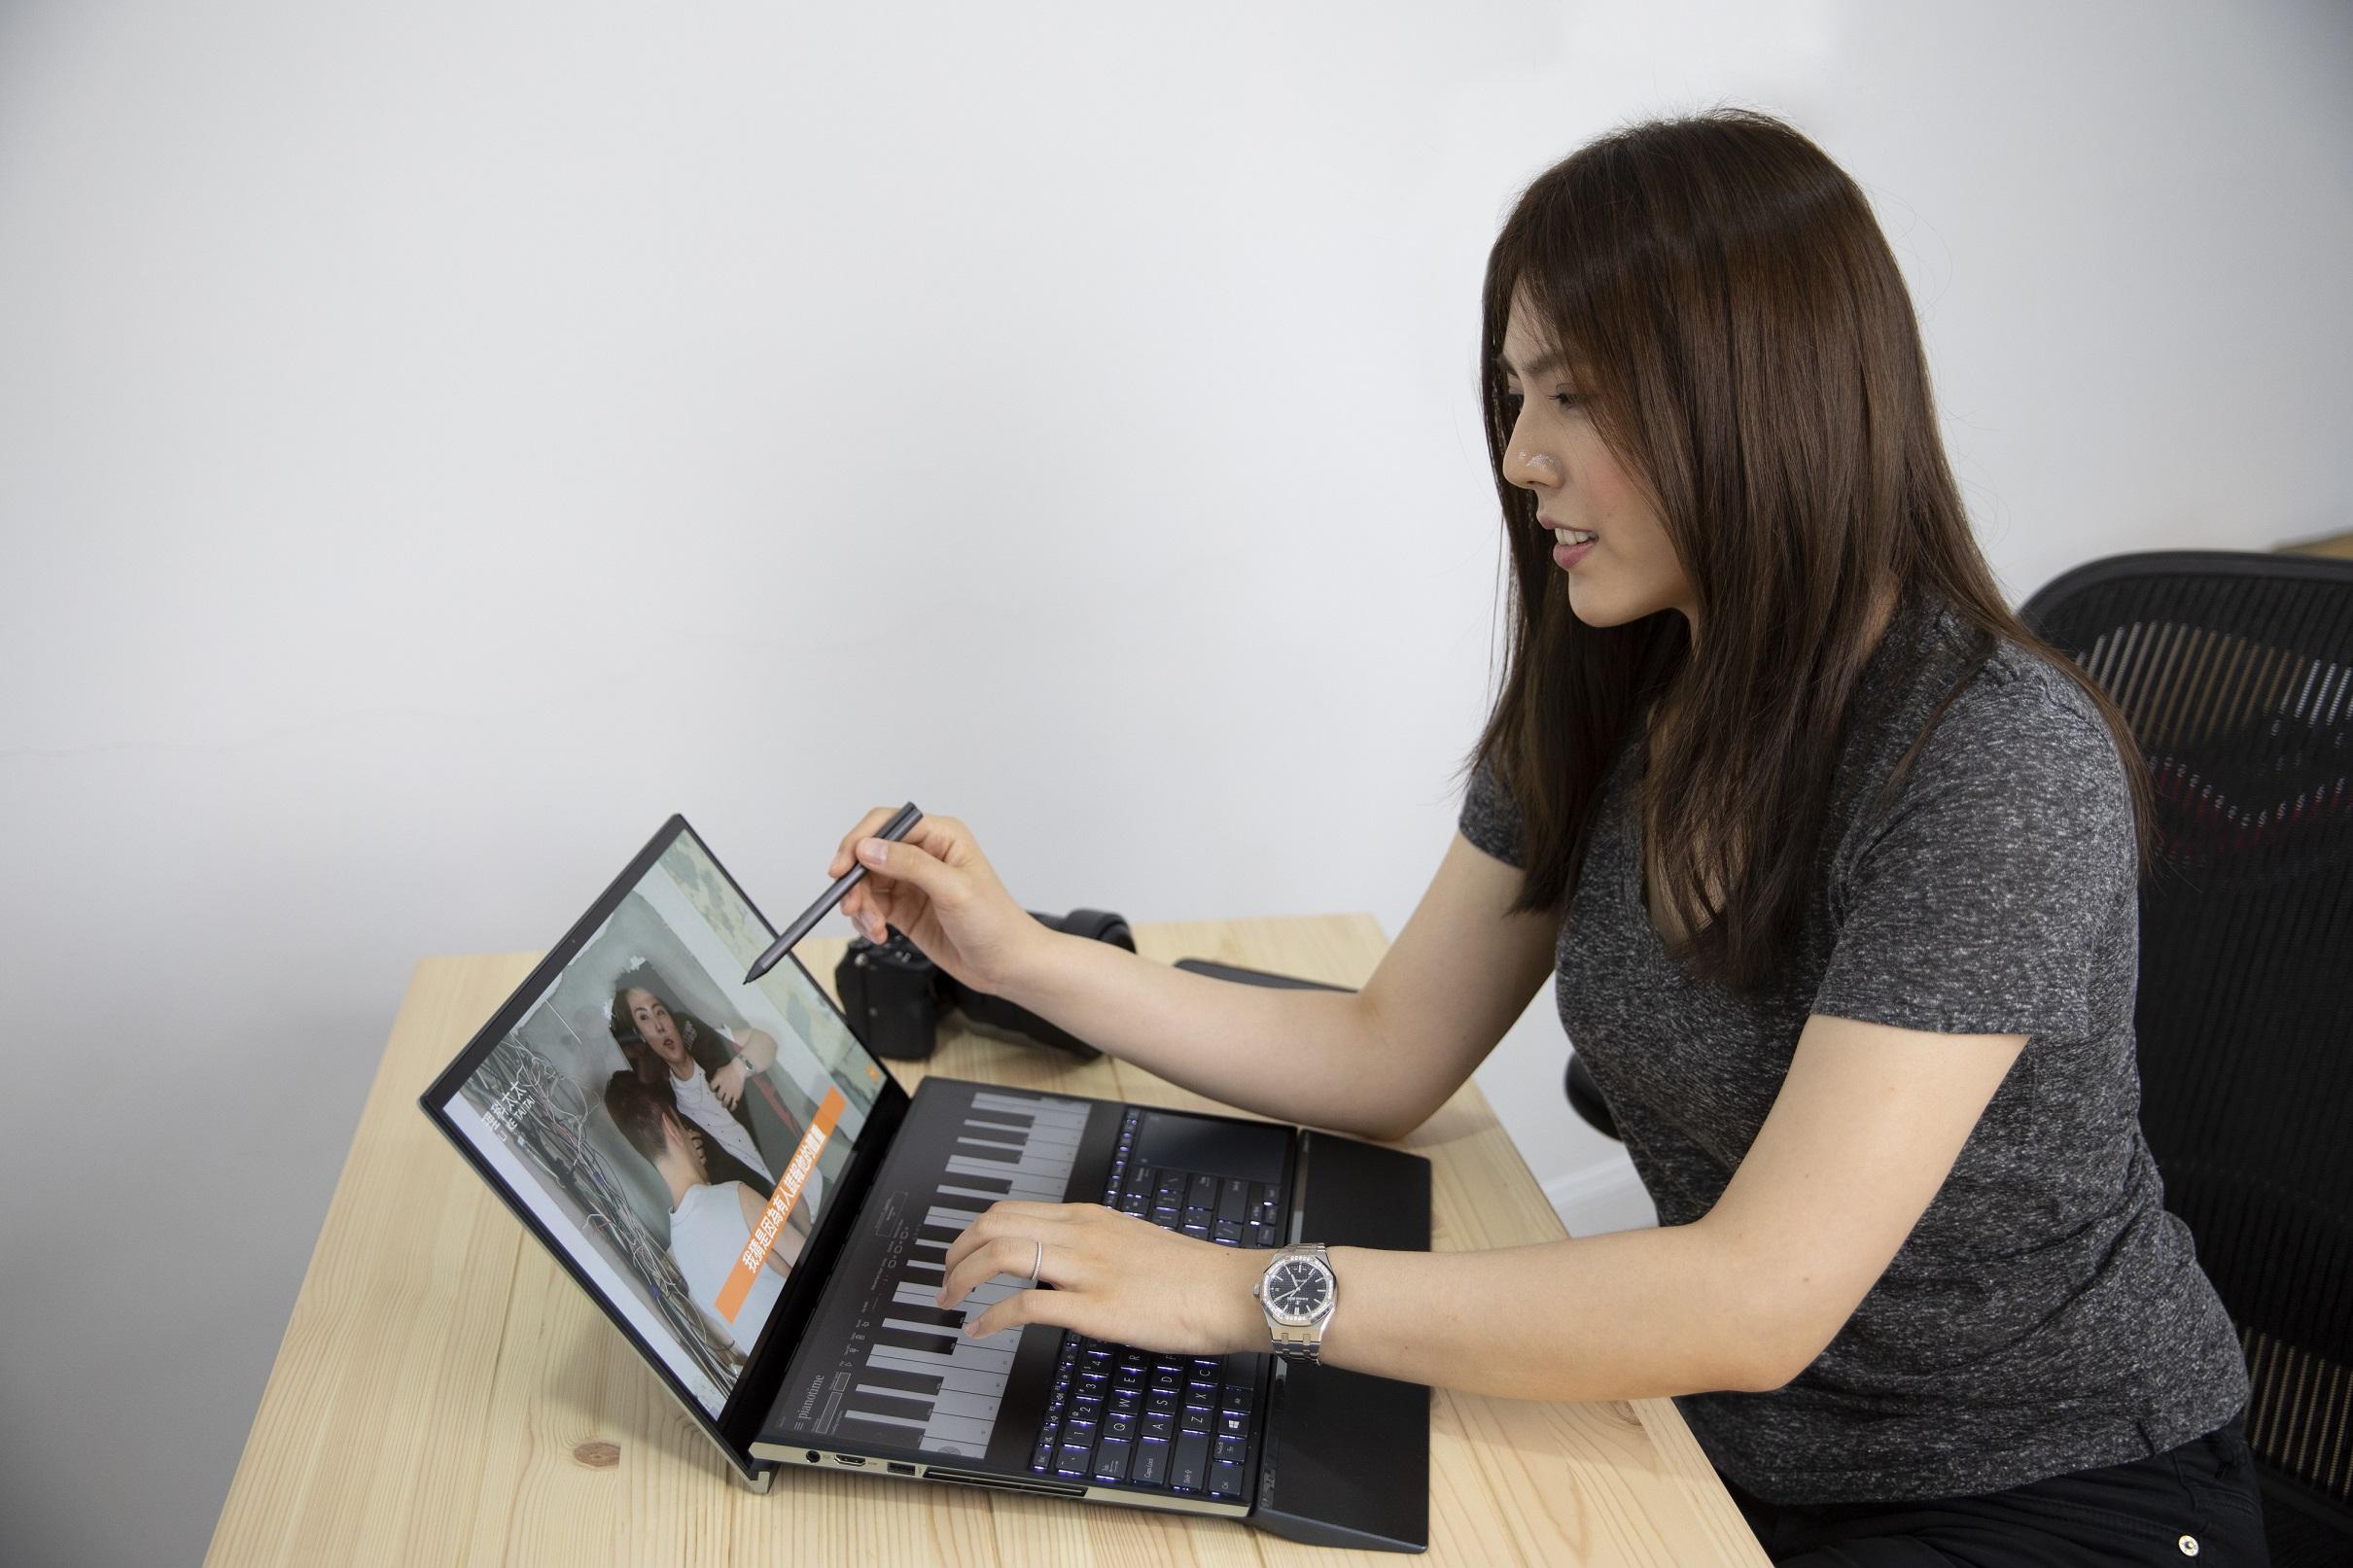 ASUS ZenBook Pro Duo進行音樂剪輯、影片後製等繁雜多工處理,大大提升作品的品質和速度。